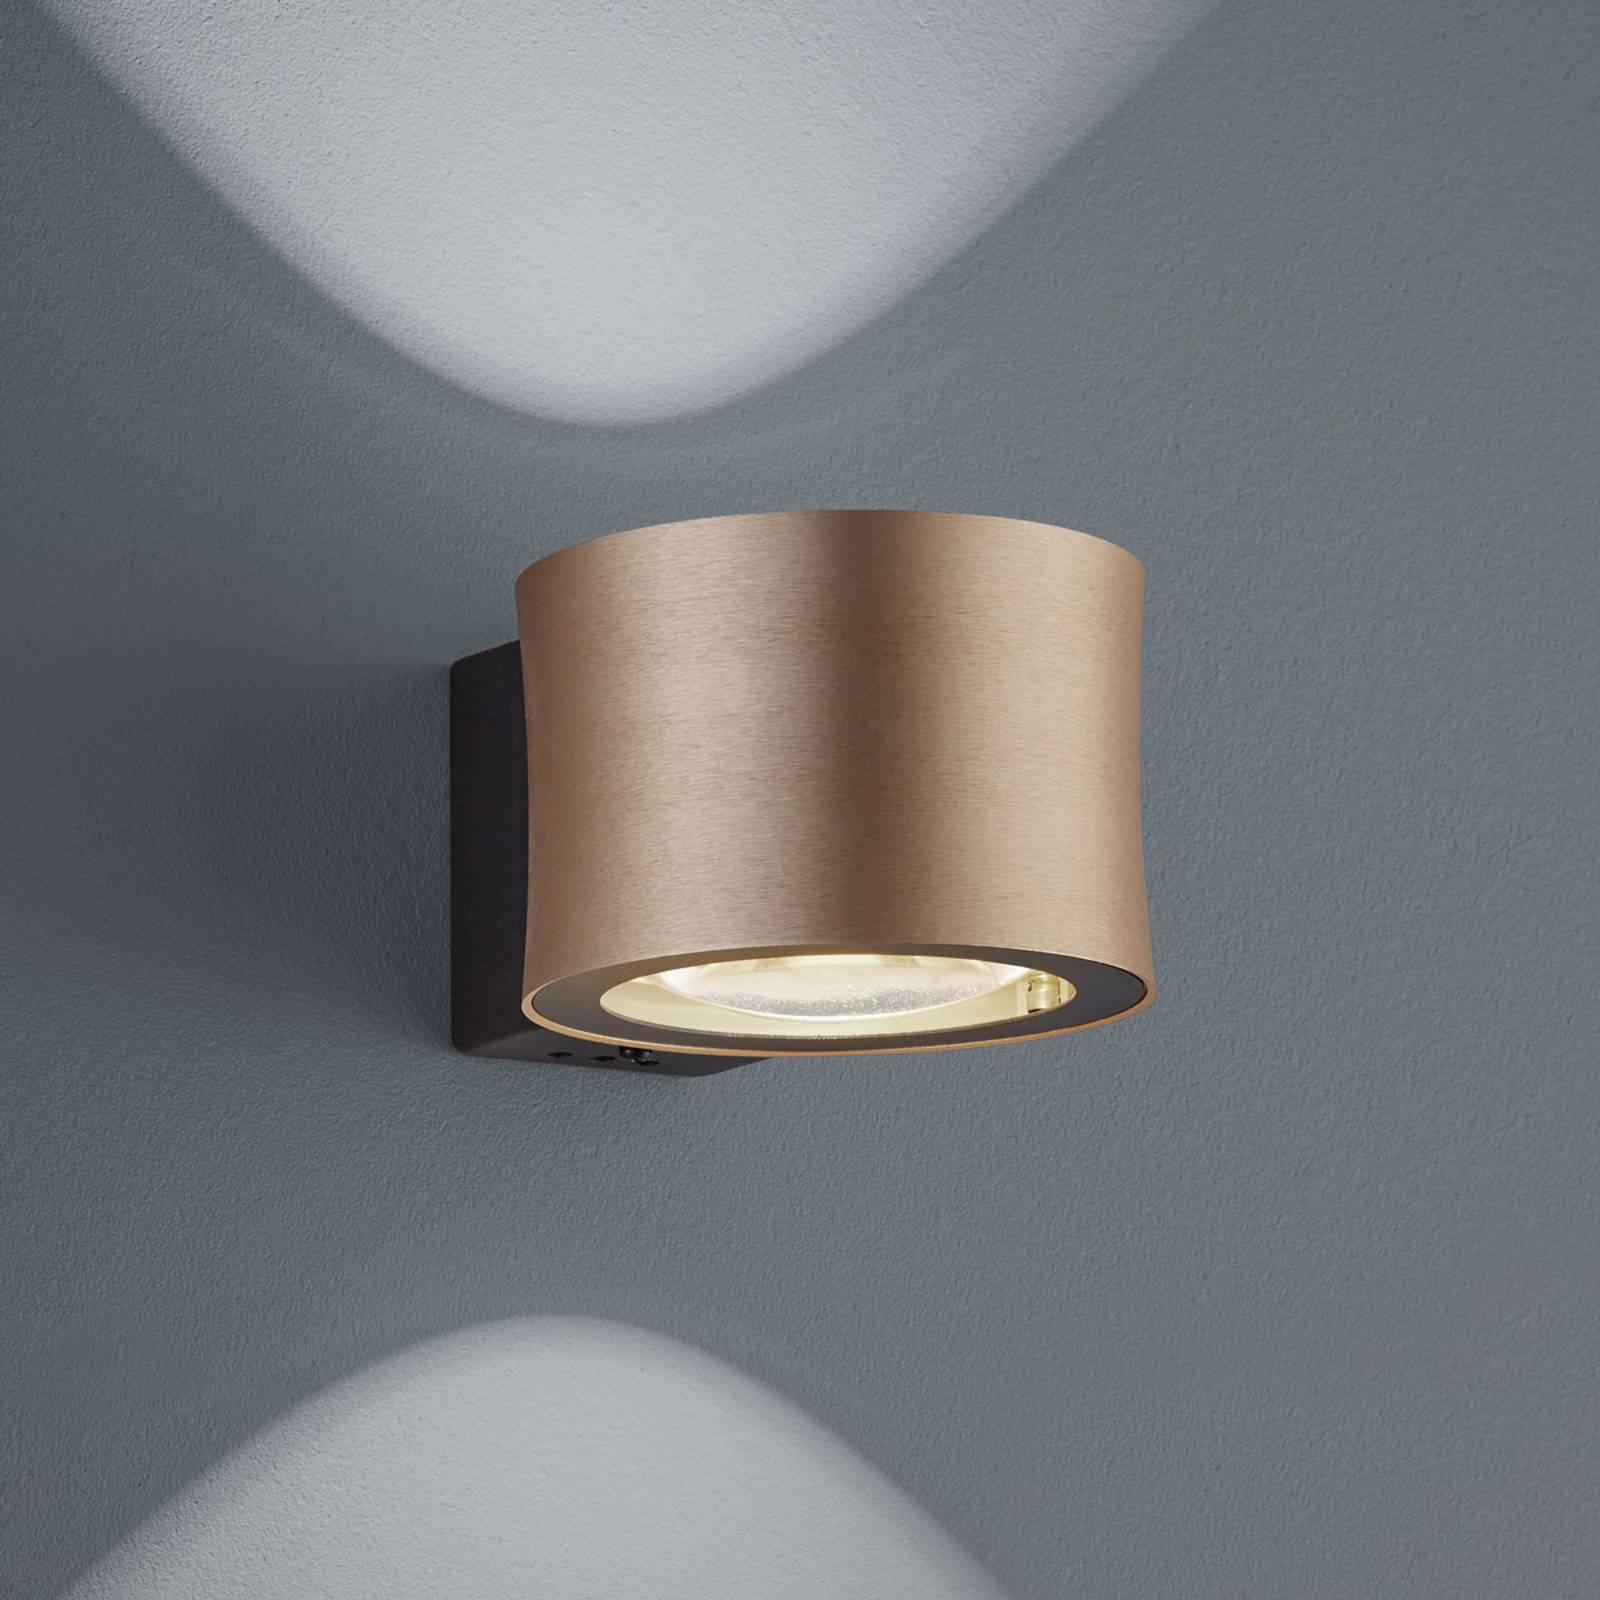 BANKAMP Impulse LED-vegglampe